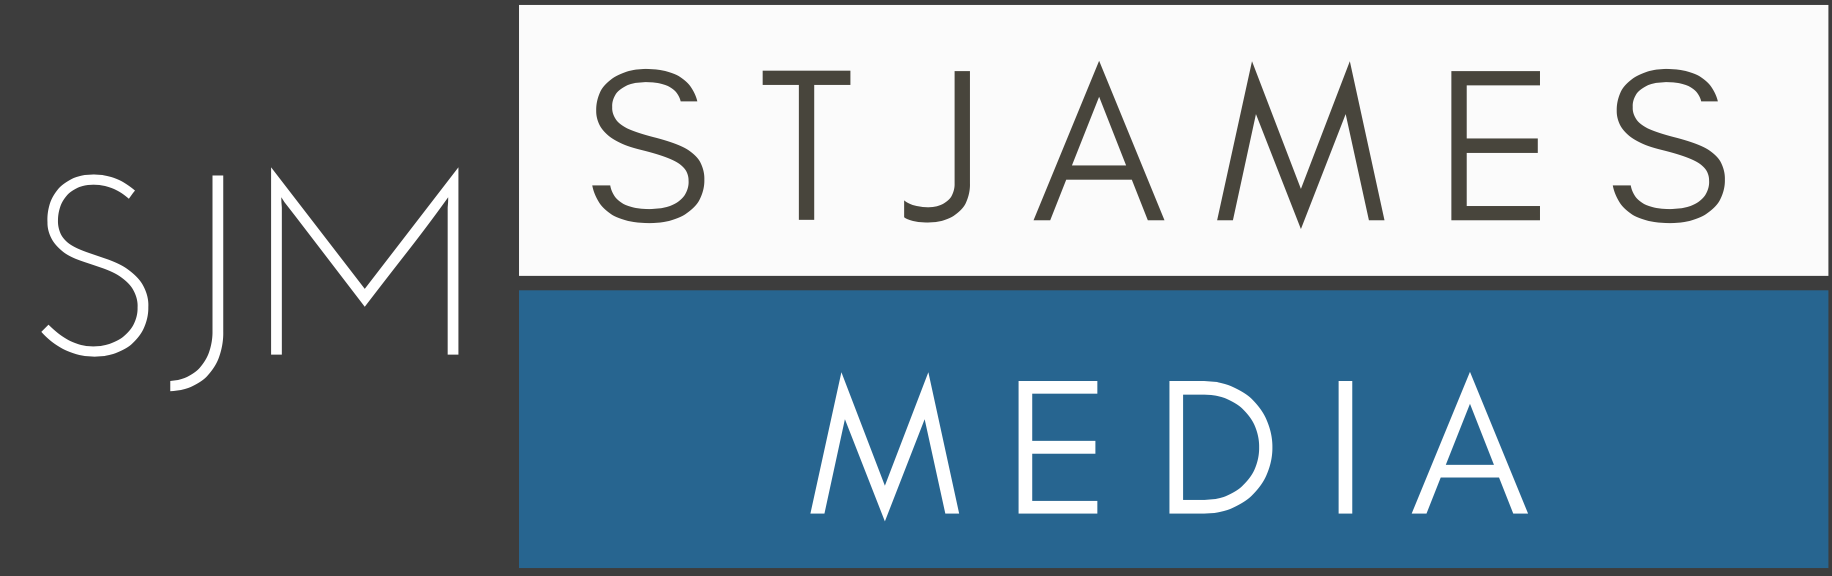 St. James Media